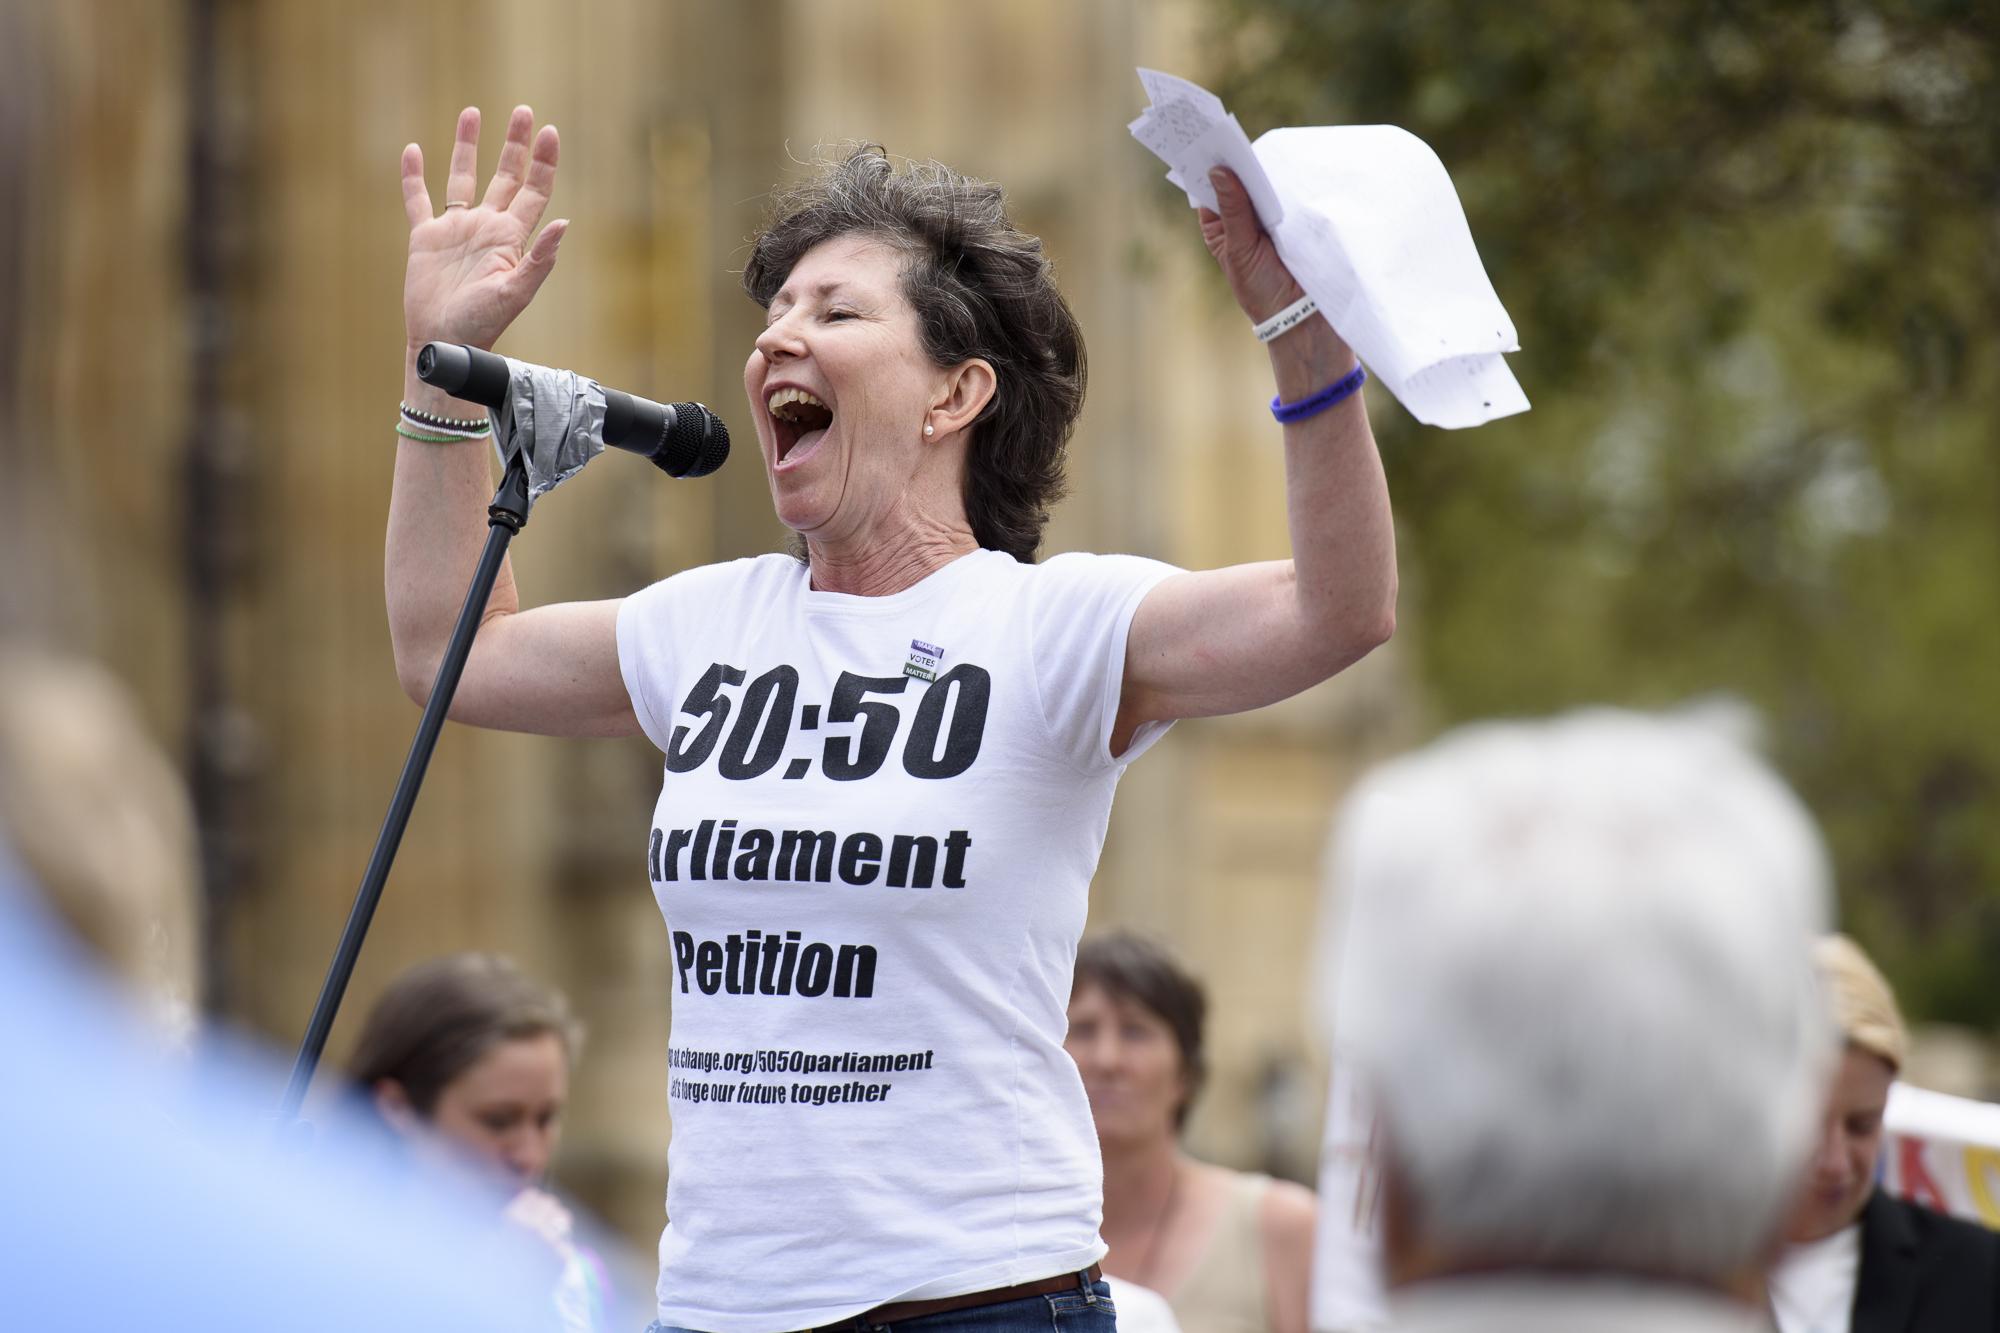 Frances Scott, 50:50 Parliament